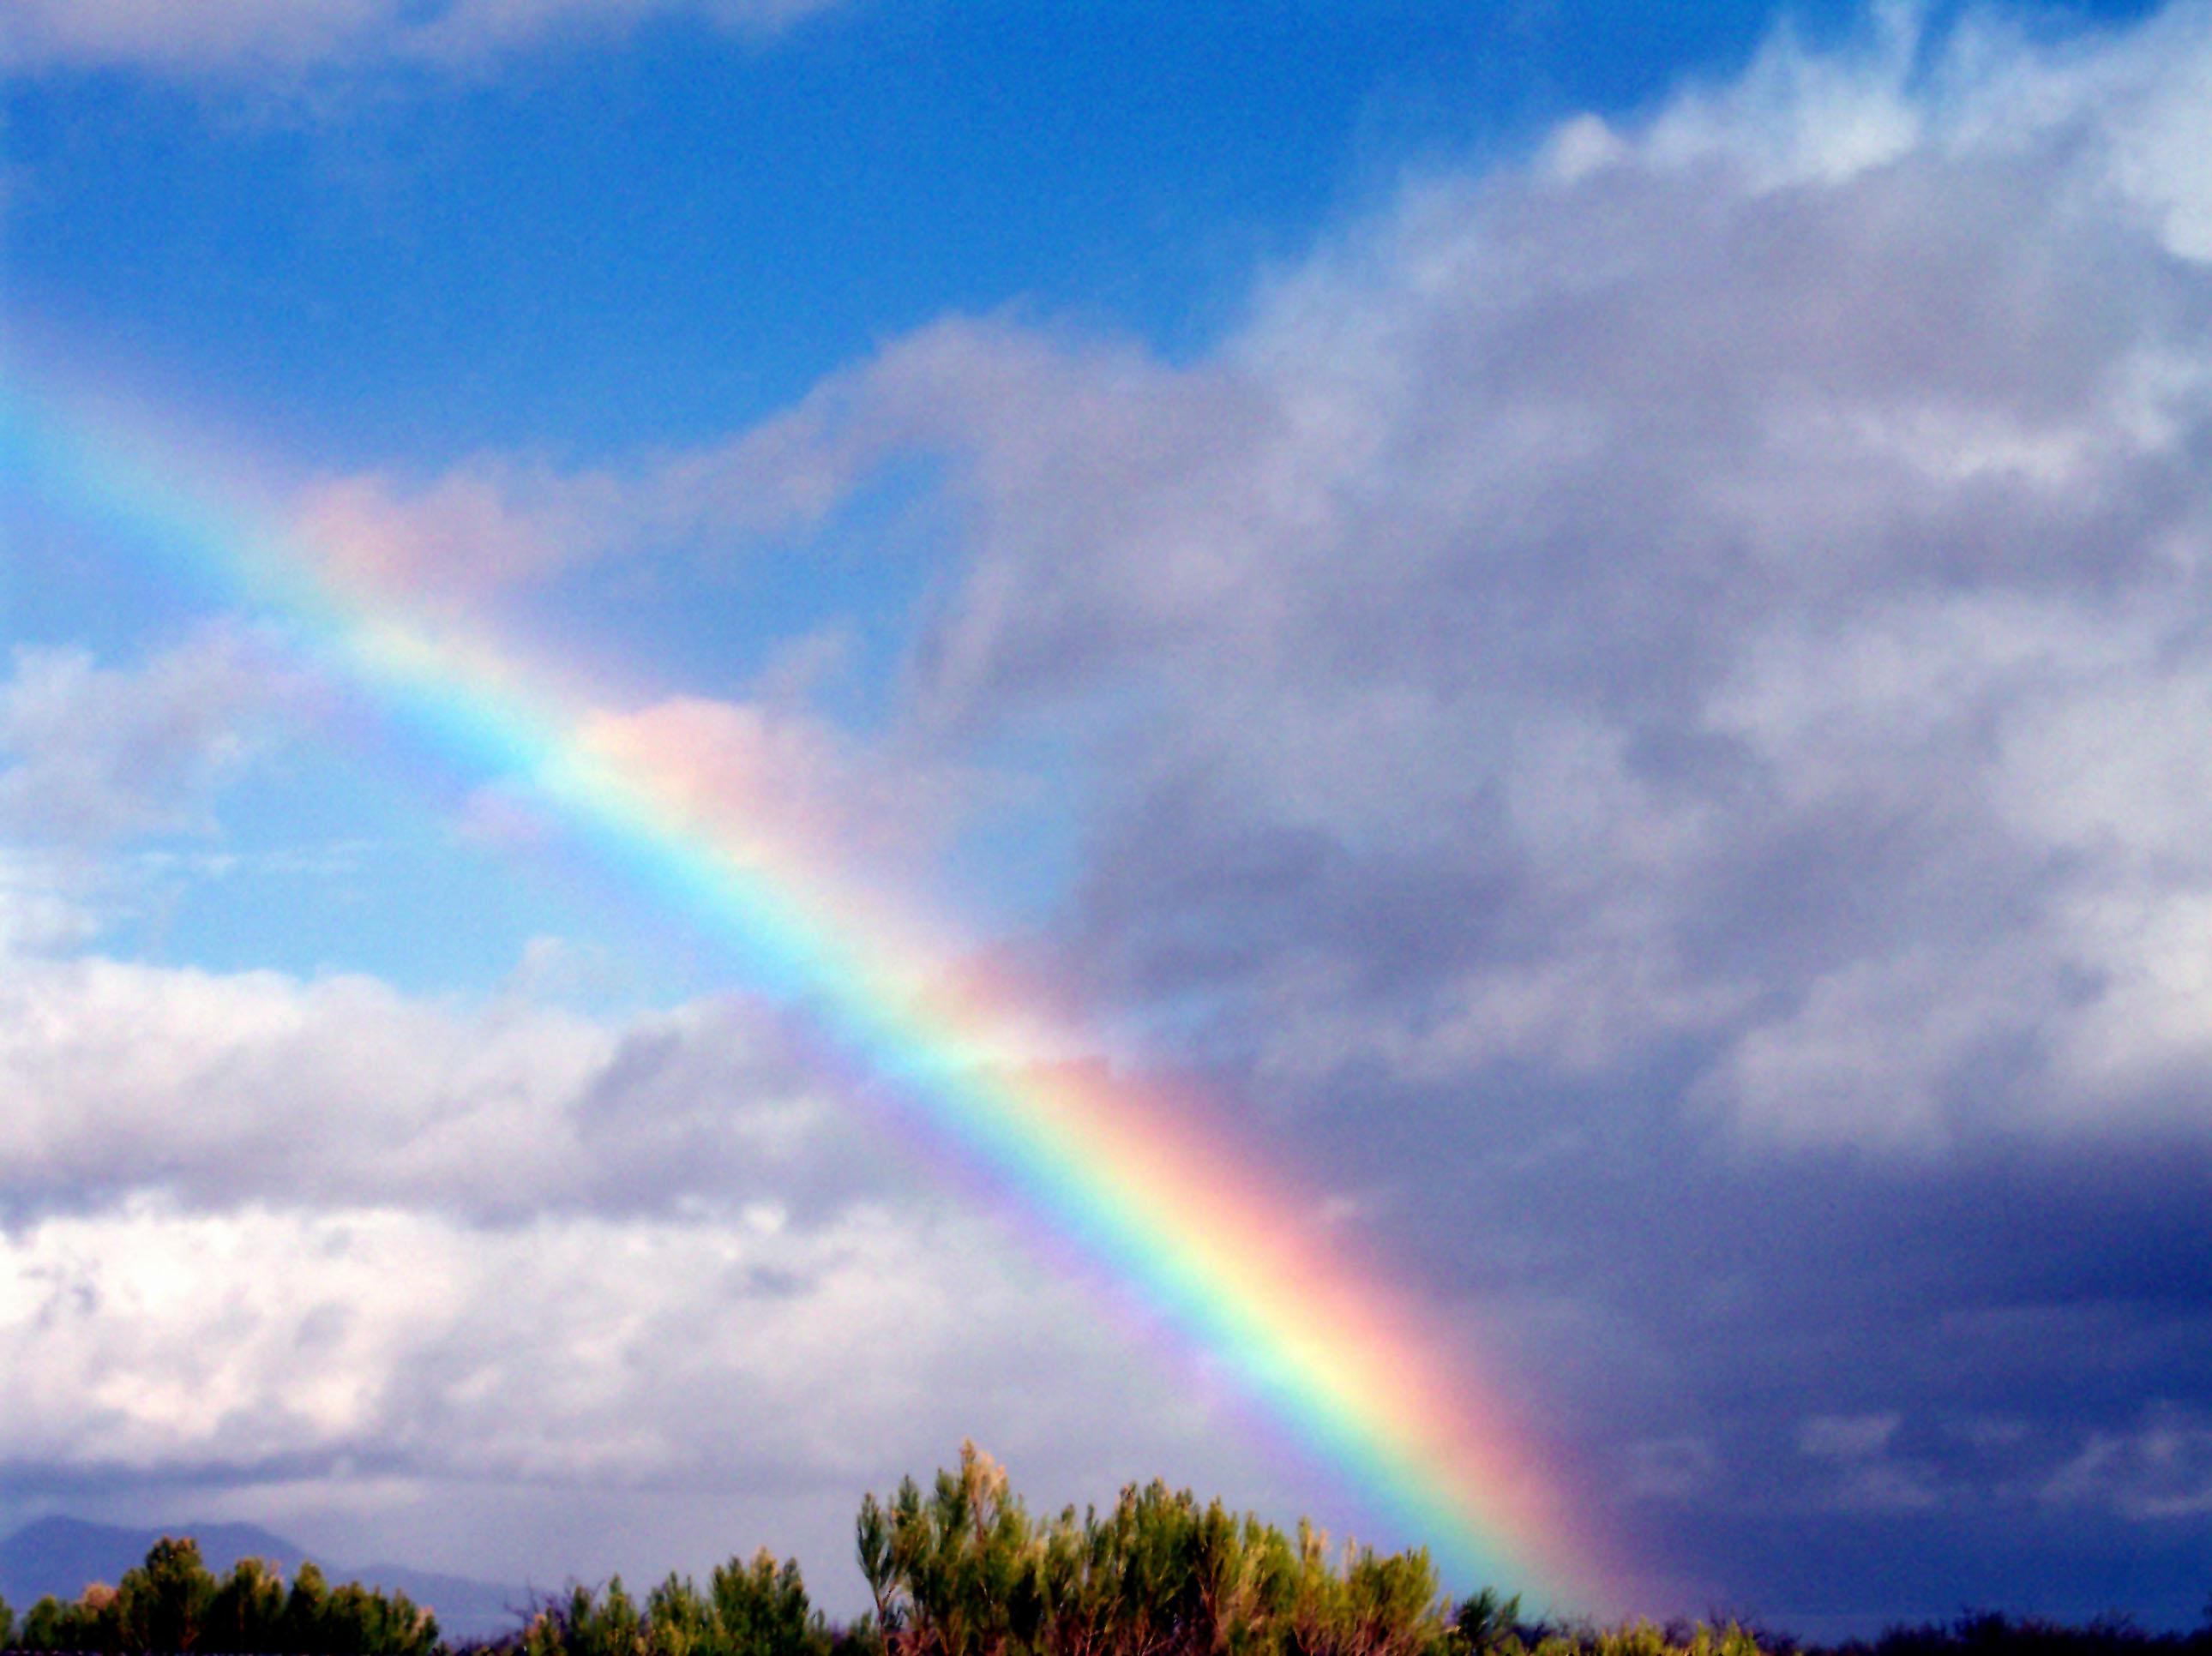 http://www.allabout-energy.com/Pphotos/rainbowofpossibility.jpg